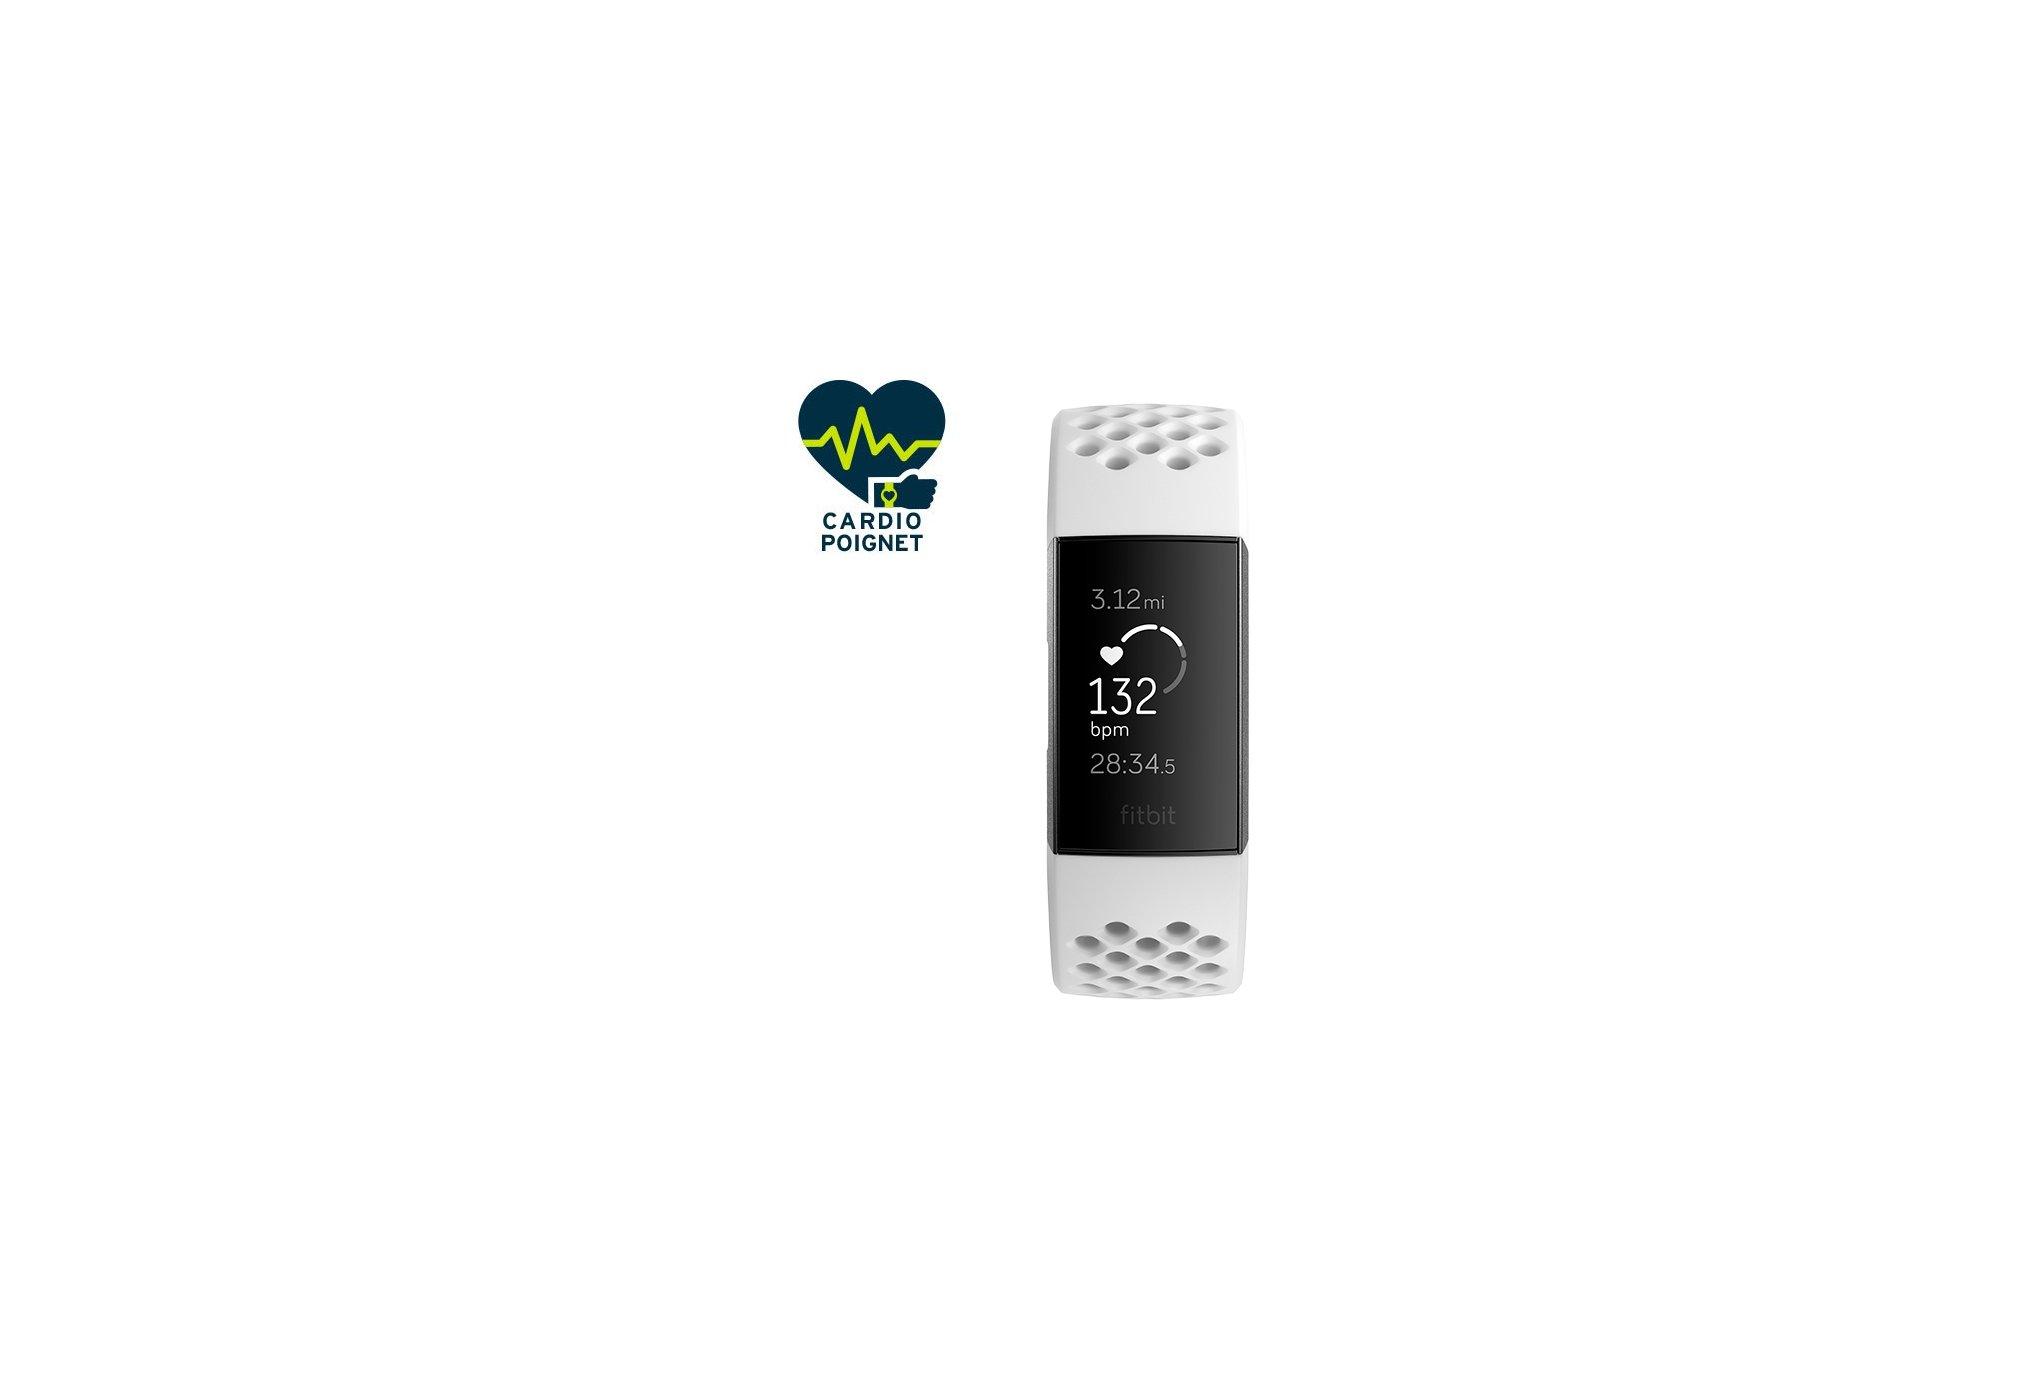 Fitbit pulsera de actividad Charge 3 Edición Especial Bracelets d'activité